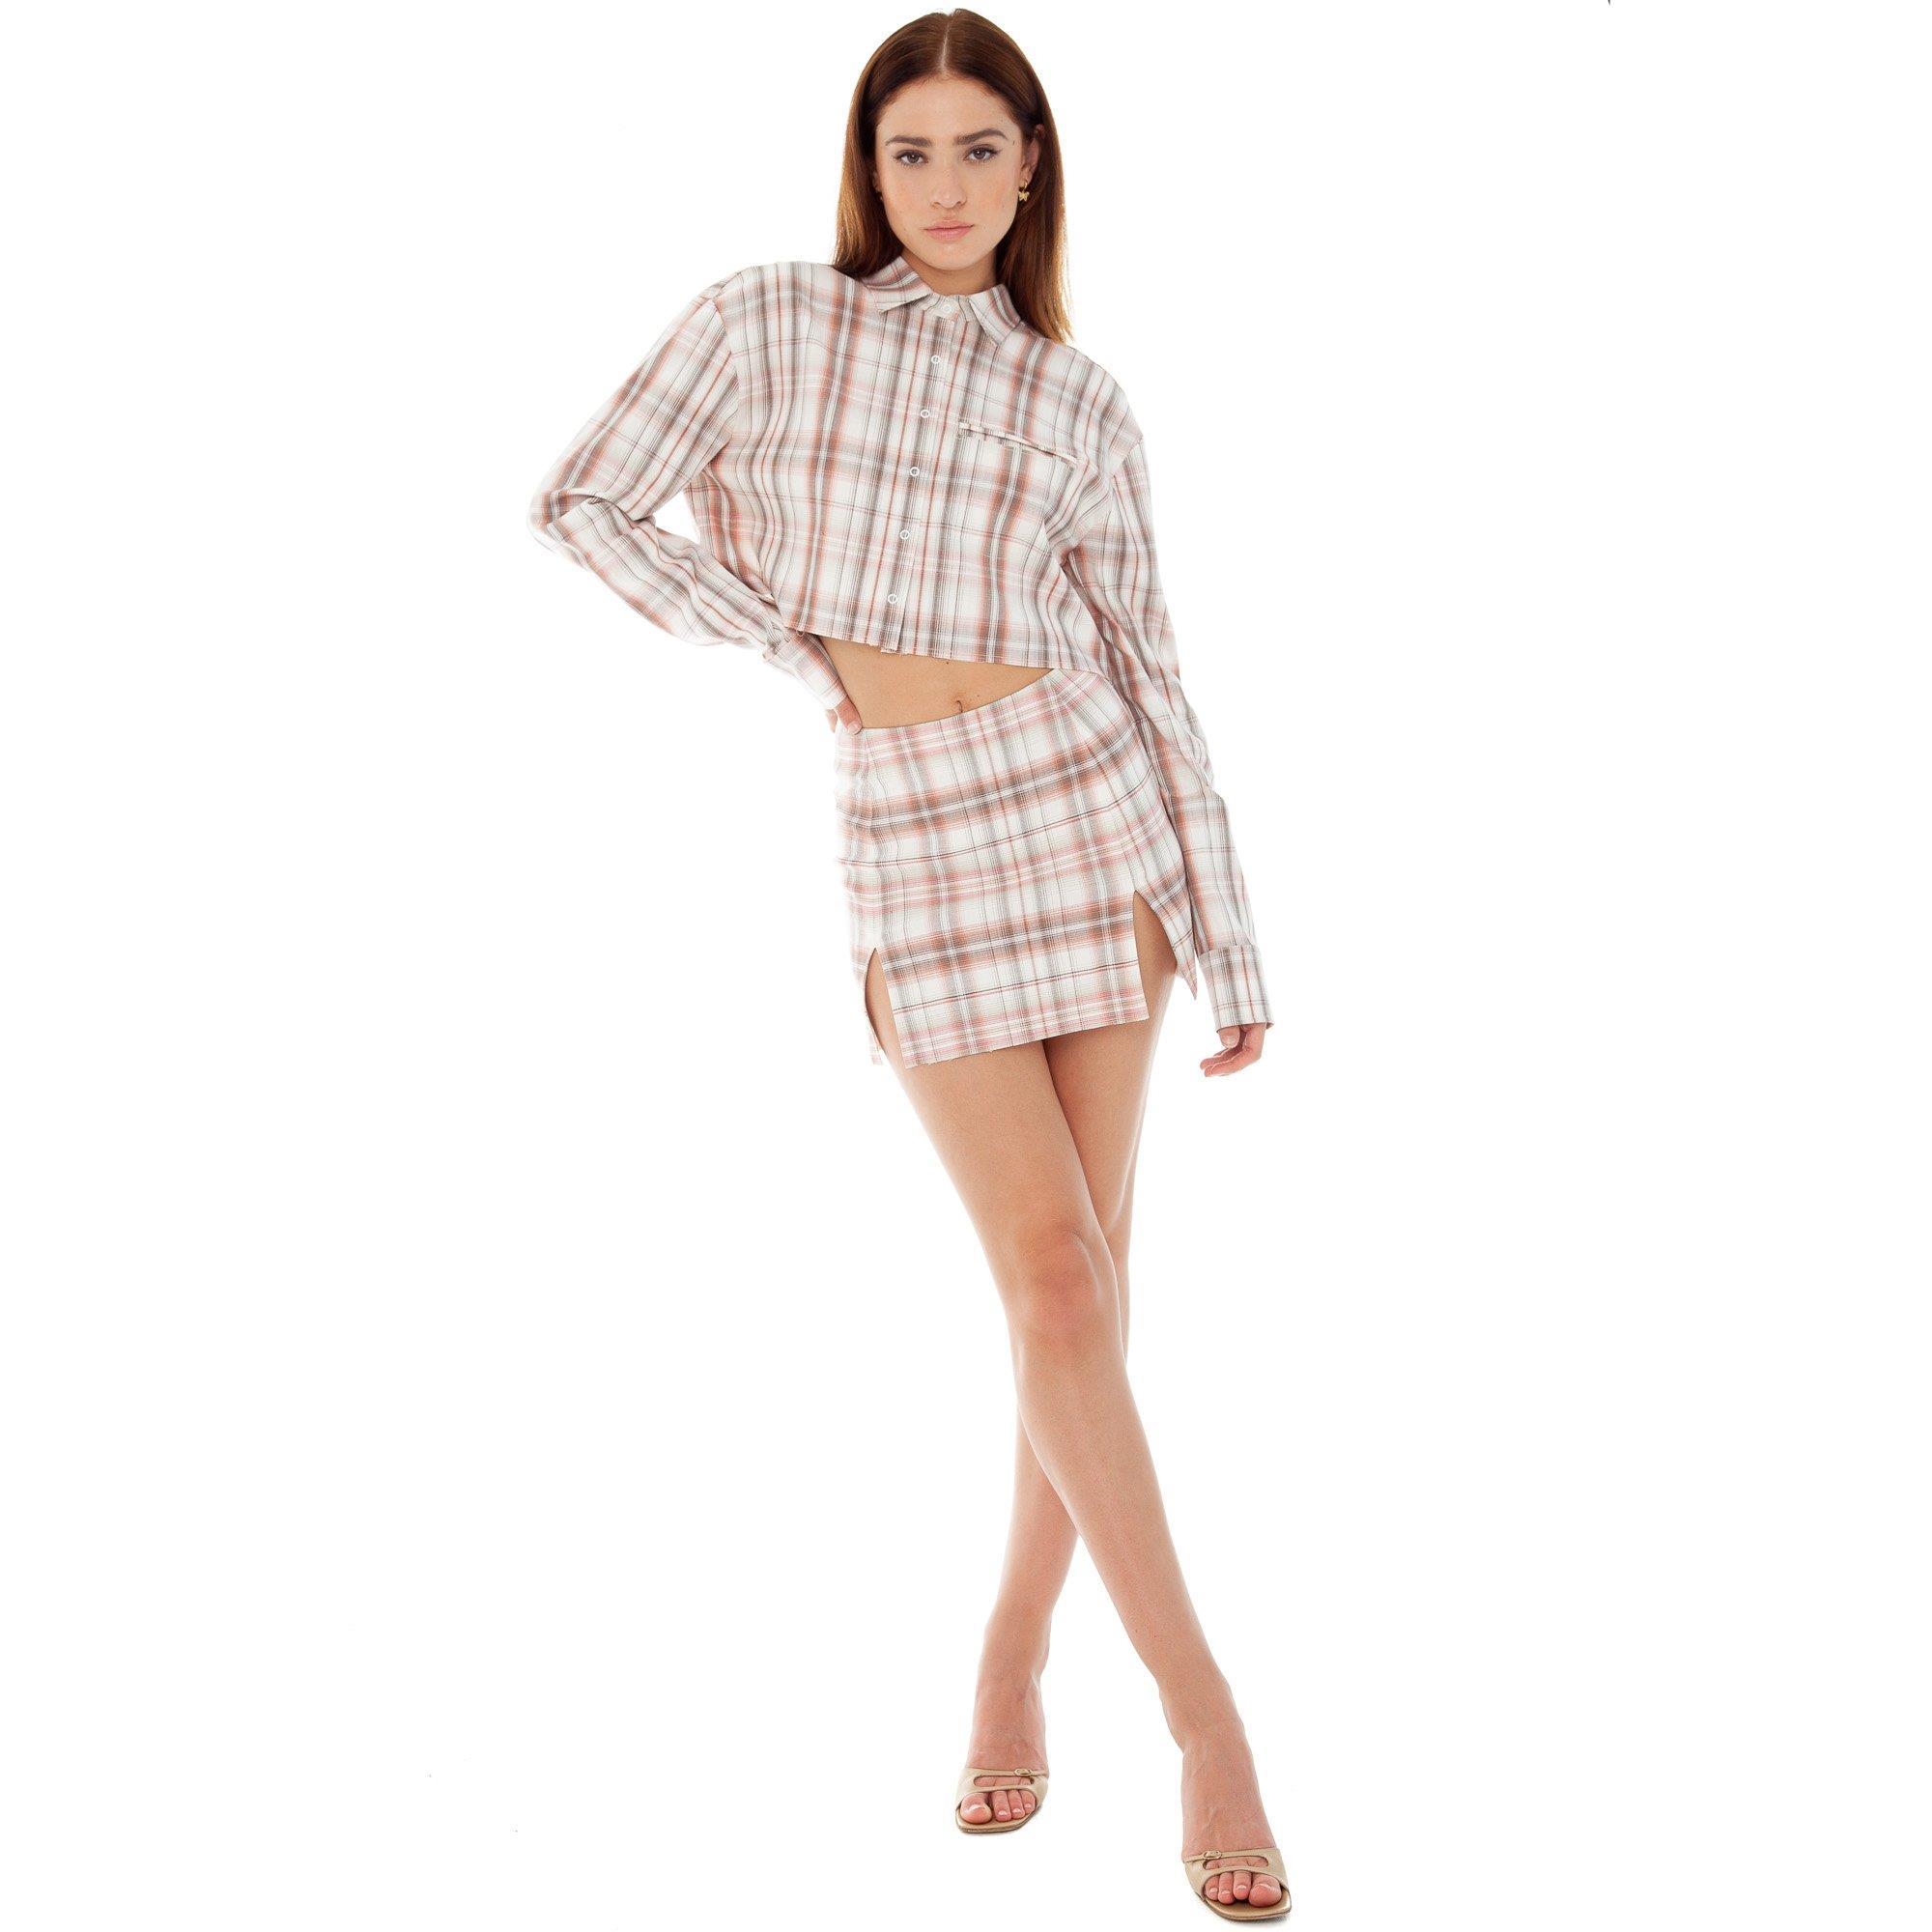 Trin Skirt